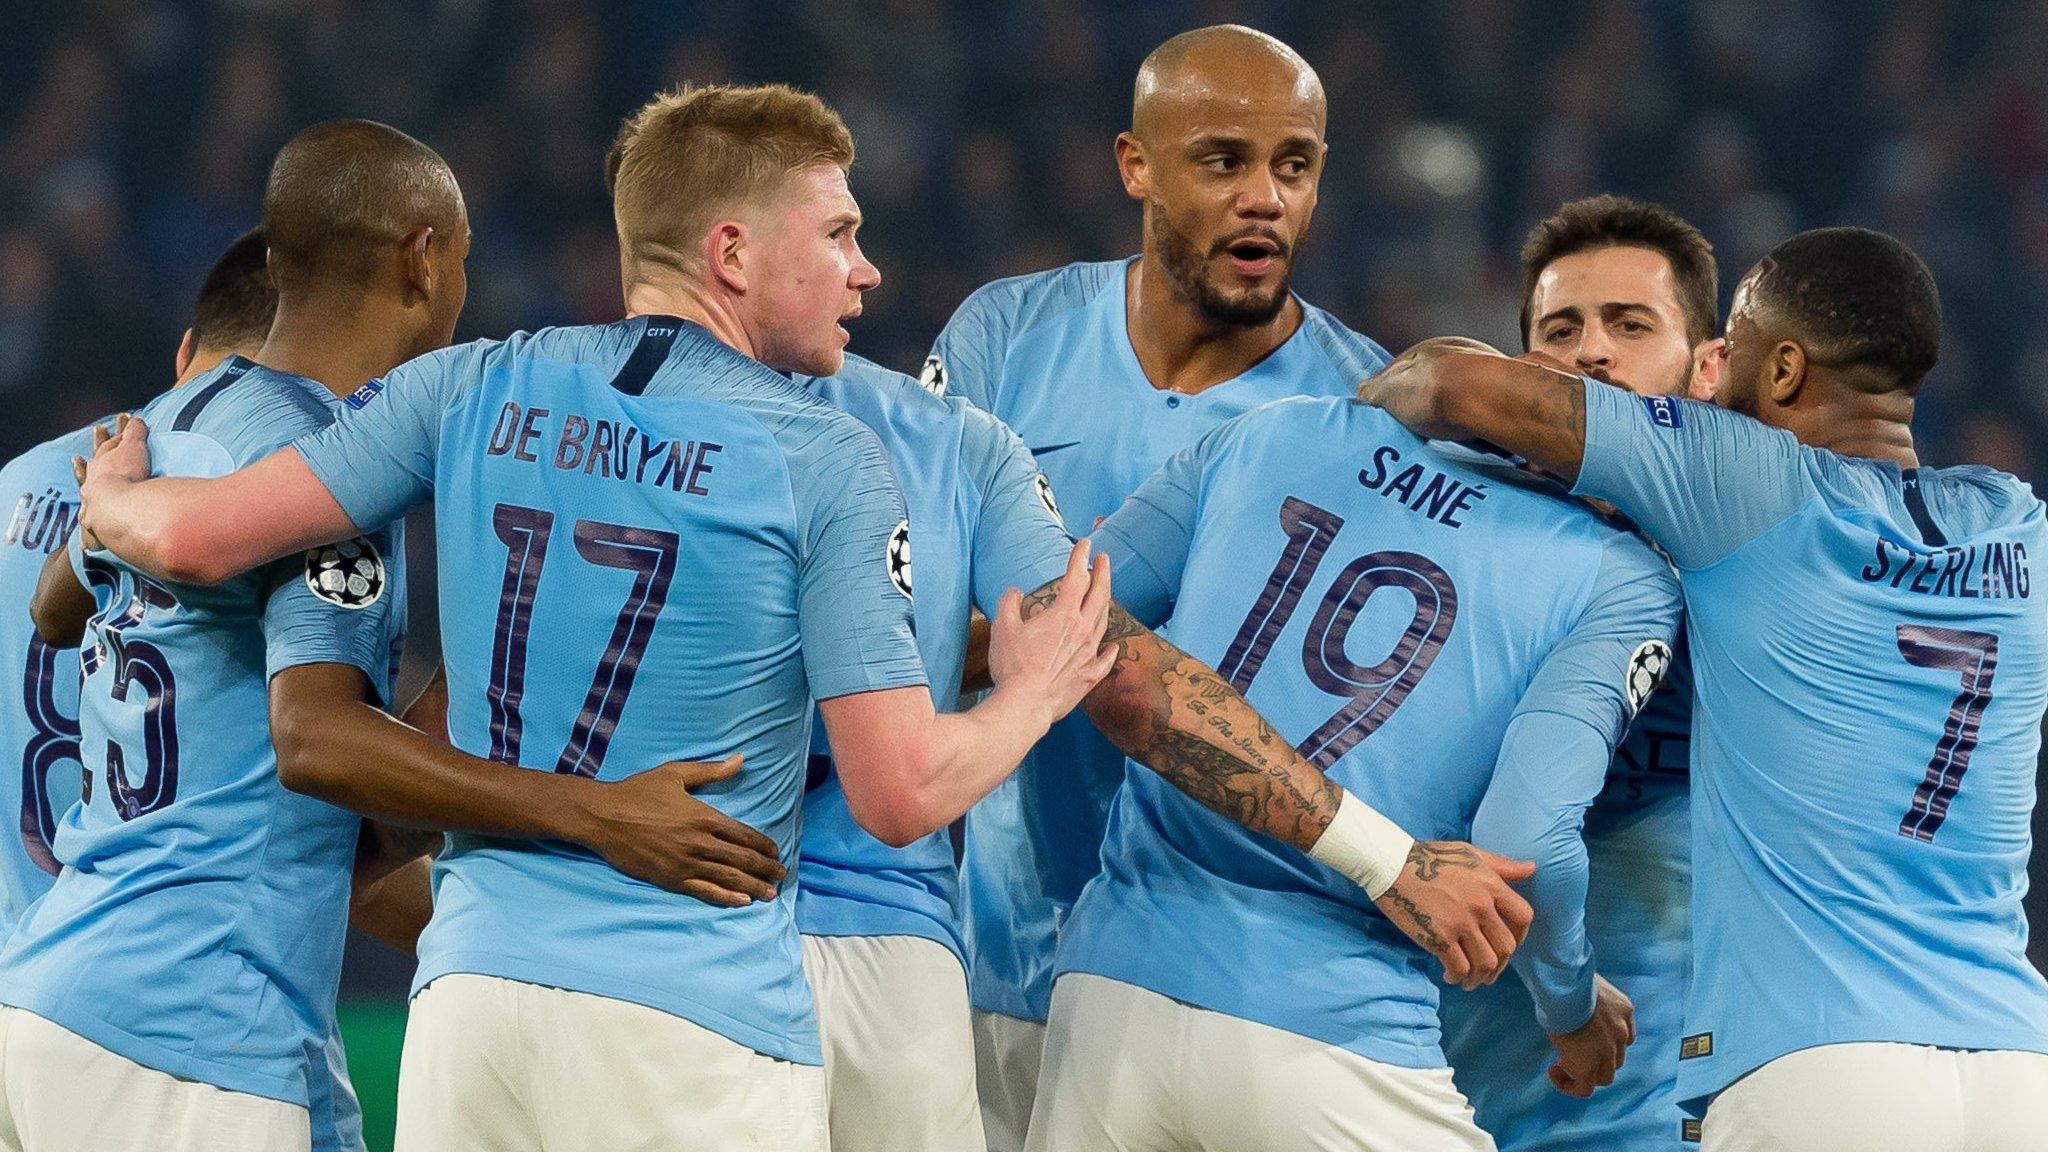 Manchester City fan Paul Worth reveals Schalke attack left him 'close to death'